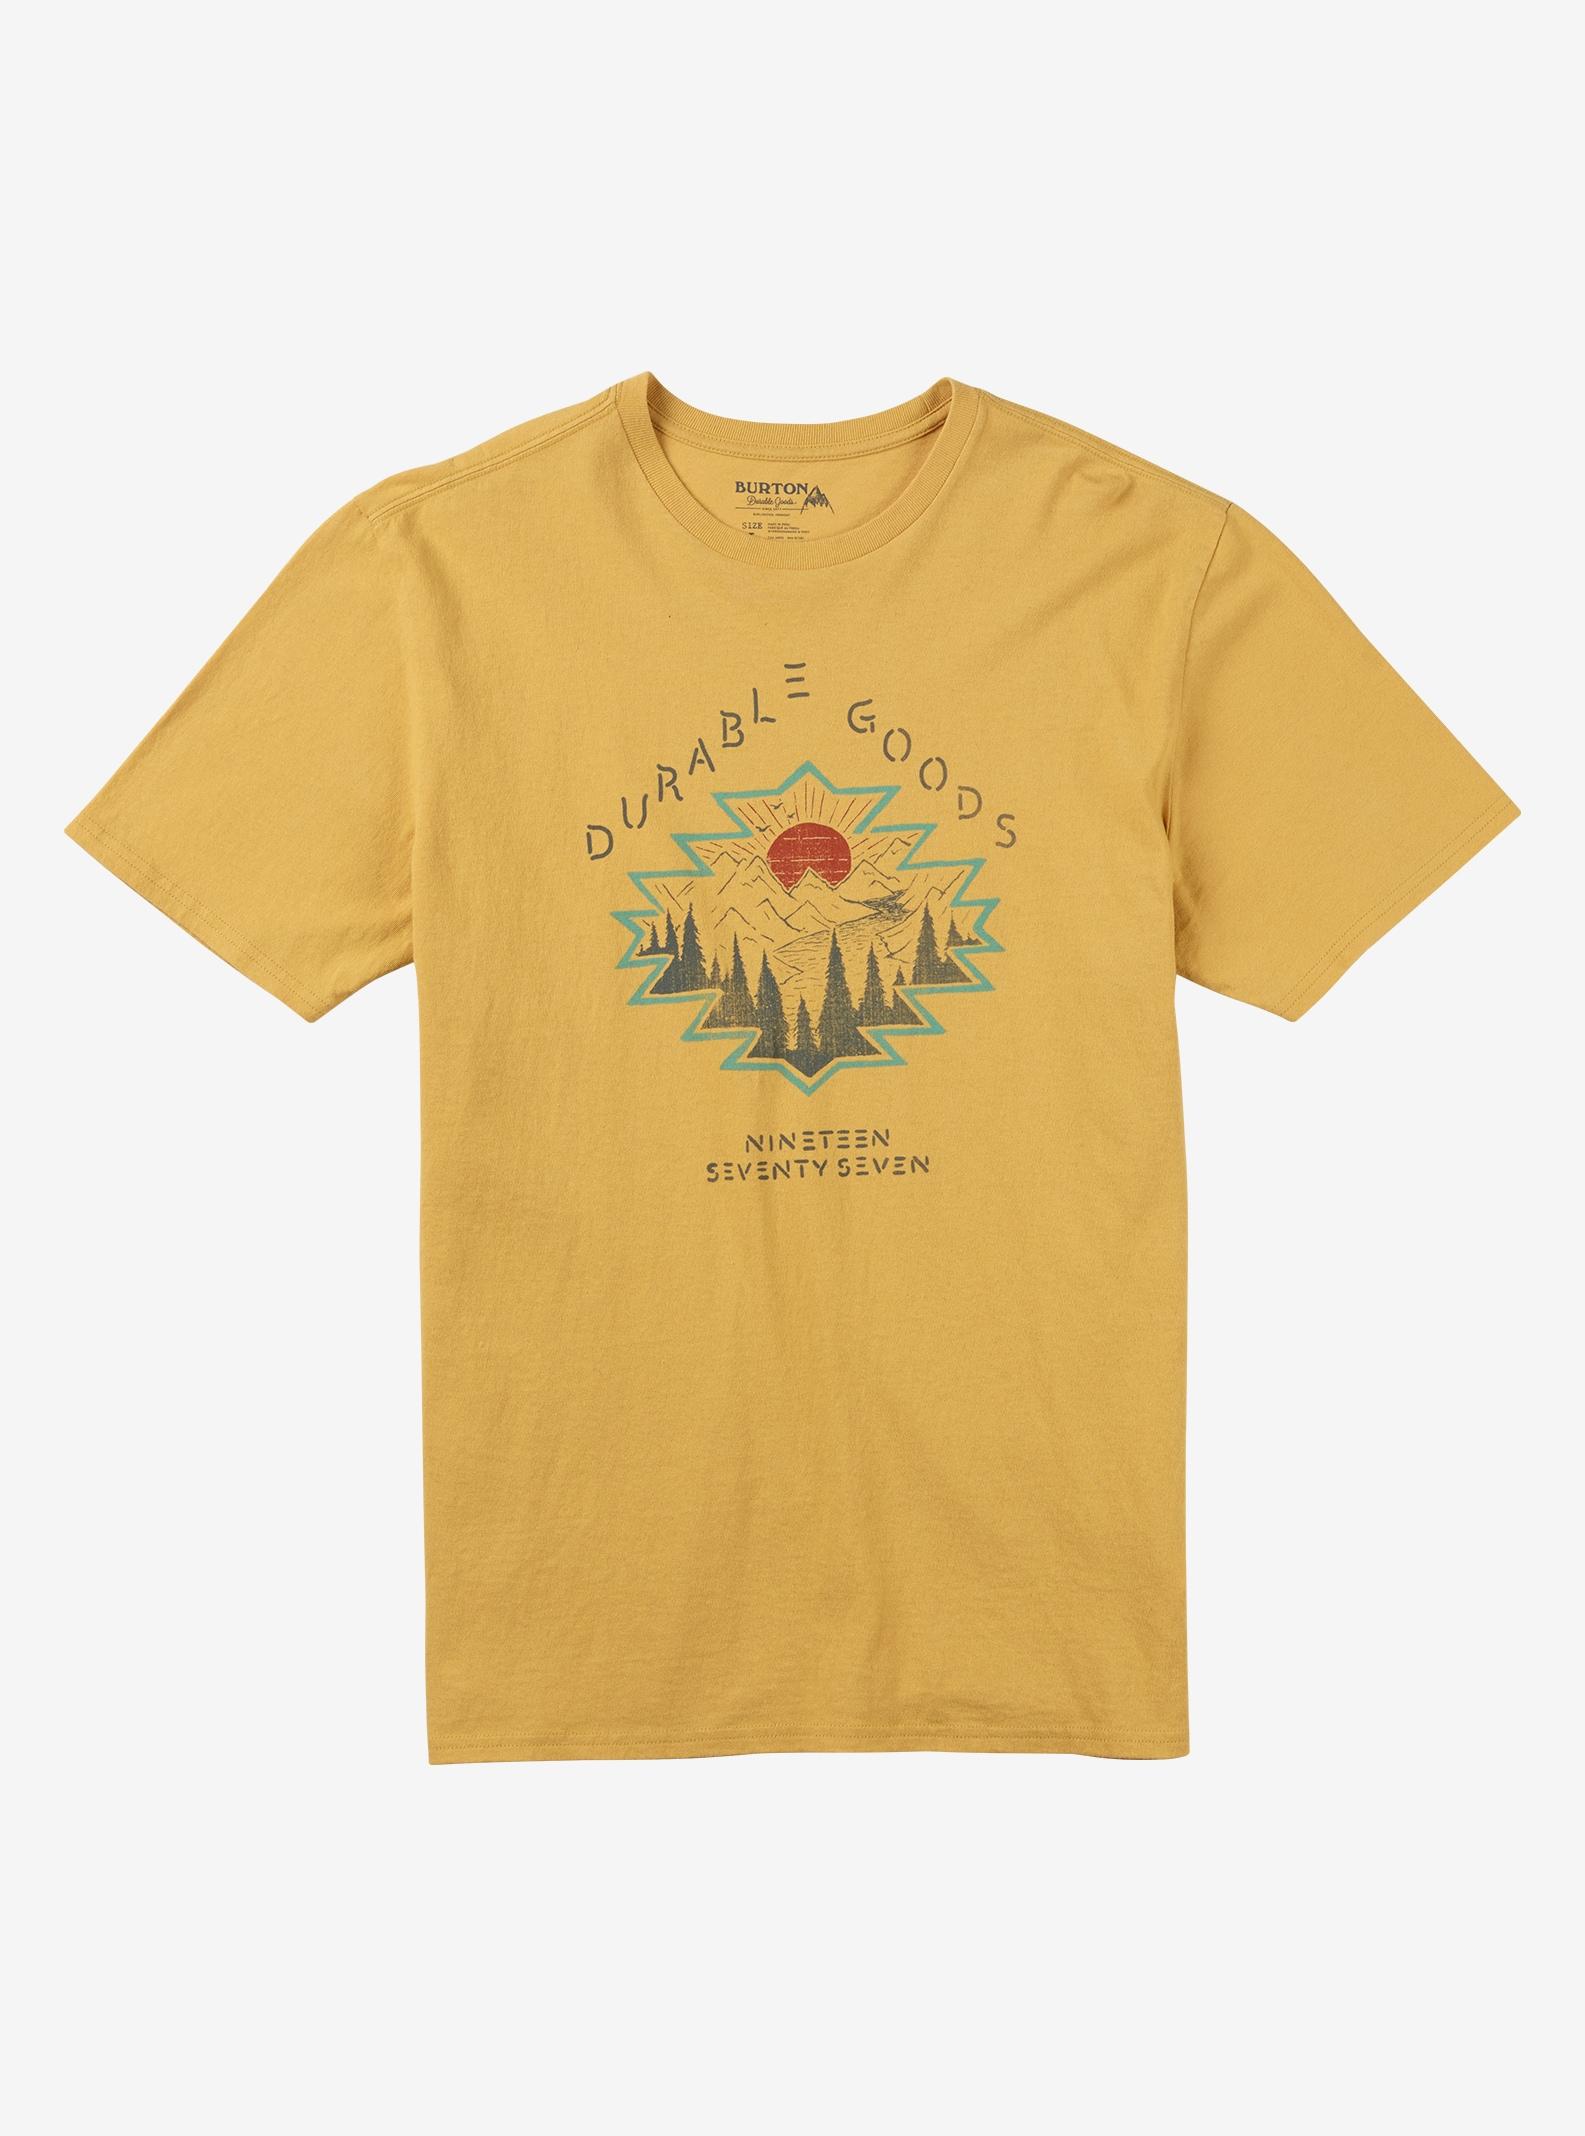 Burton Eldorado Short Sleeve T Shirt shown in Sunrise